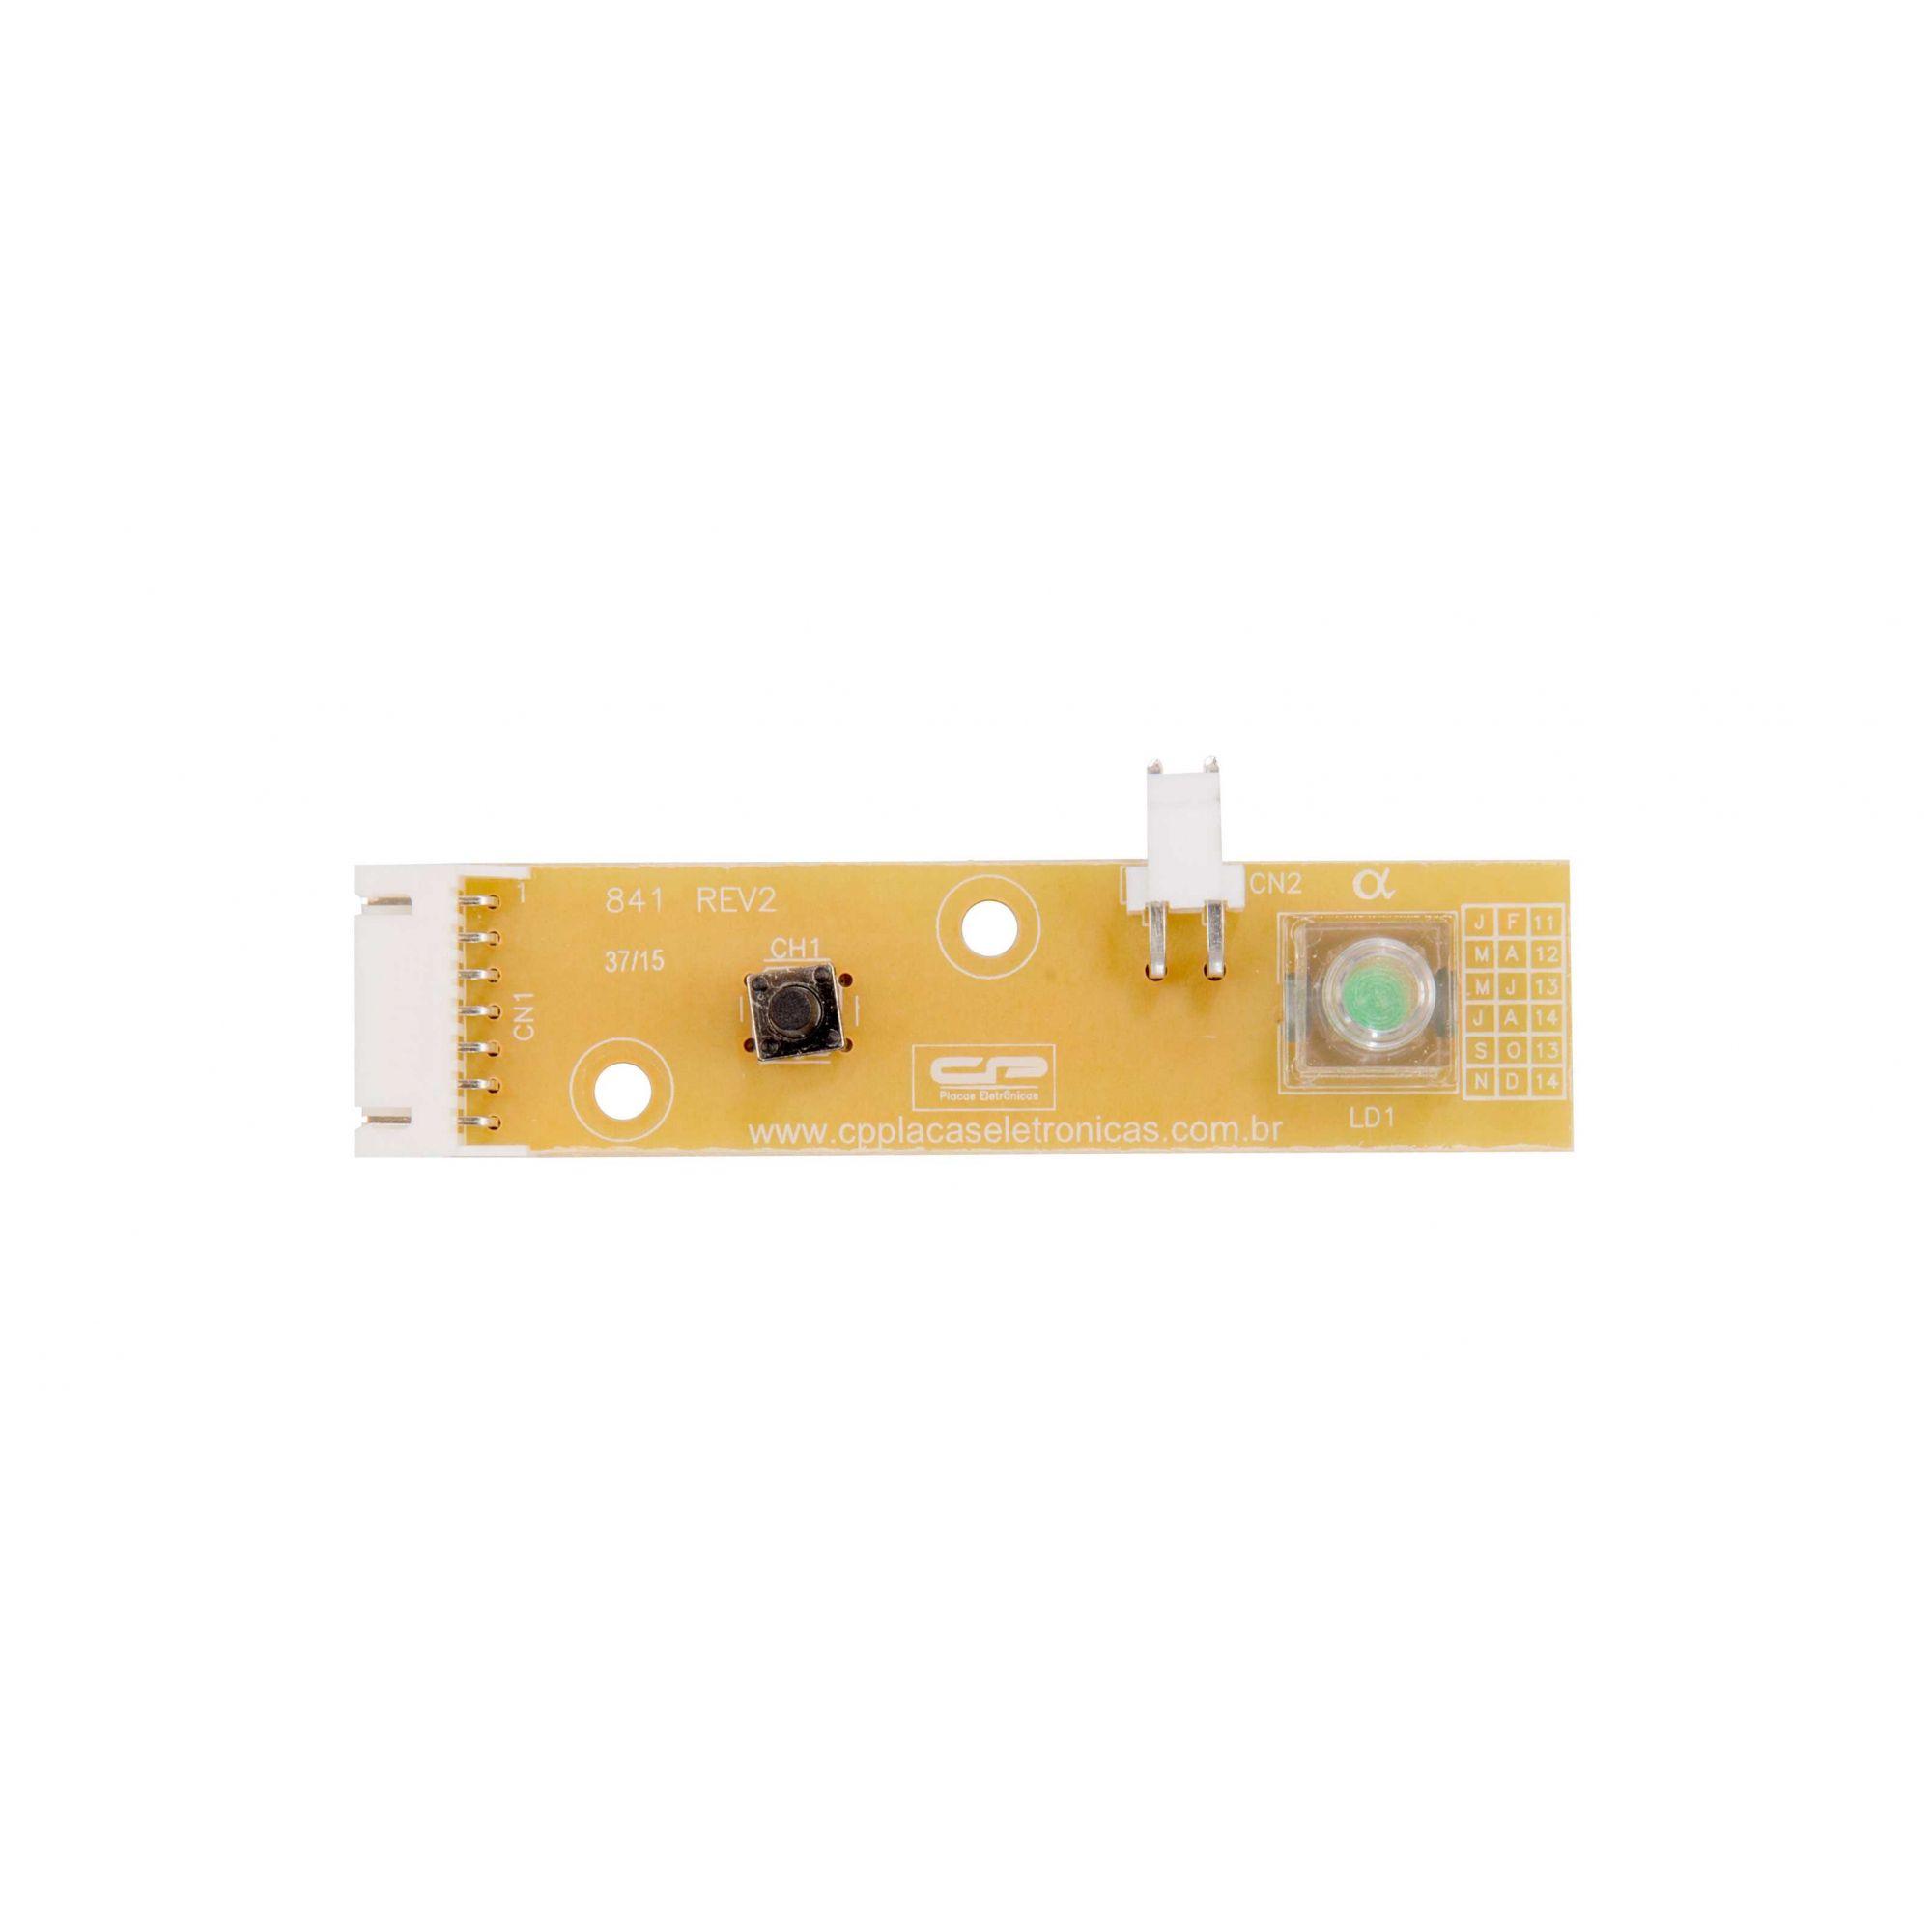 PLACA ELETRONICA LAVADORA ELECTROLUX LT60 CP0992